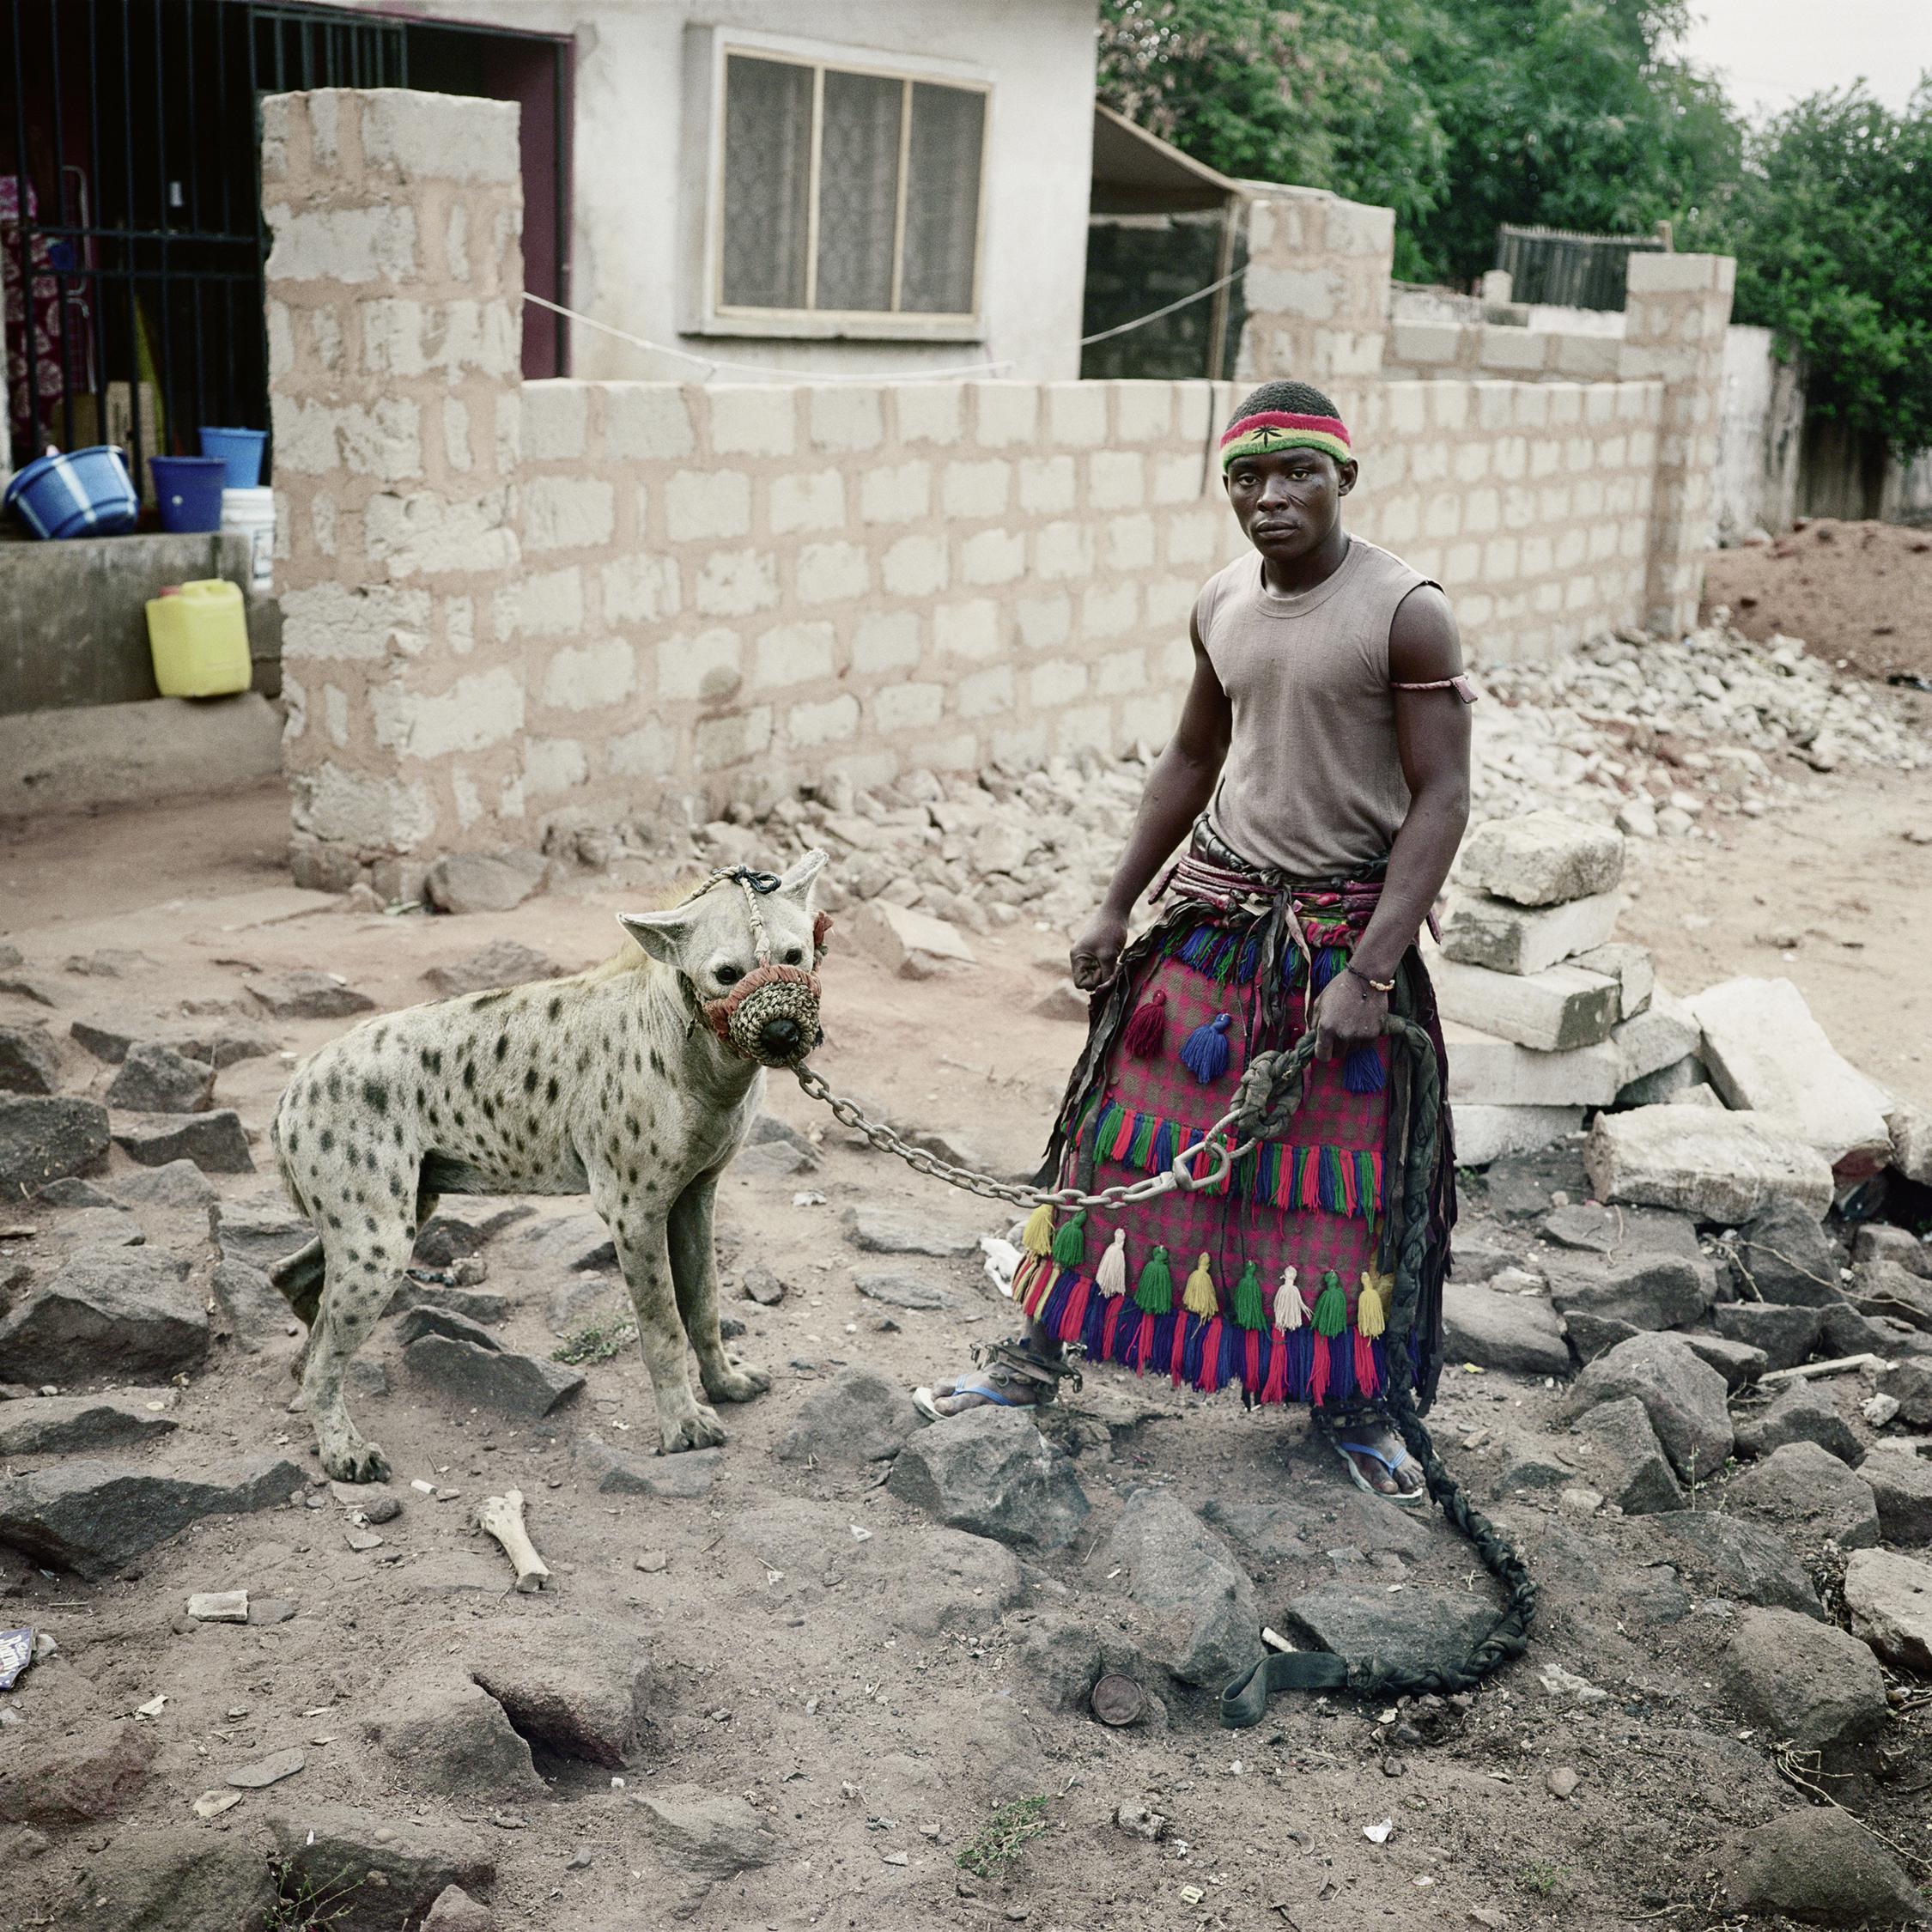 Pieter Hugo_Mohammed Rabiu with Jamis, Asaba, Nigeria (2007) Taylor Collection Denver